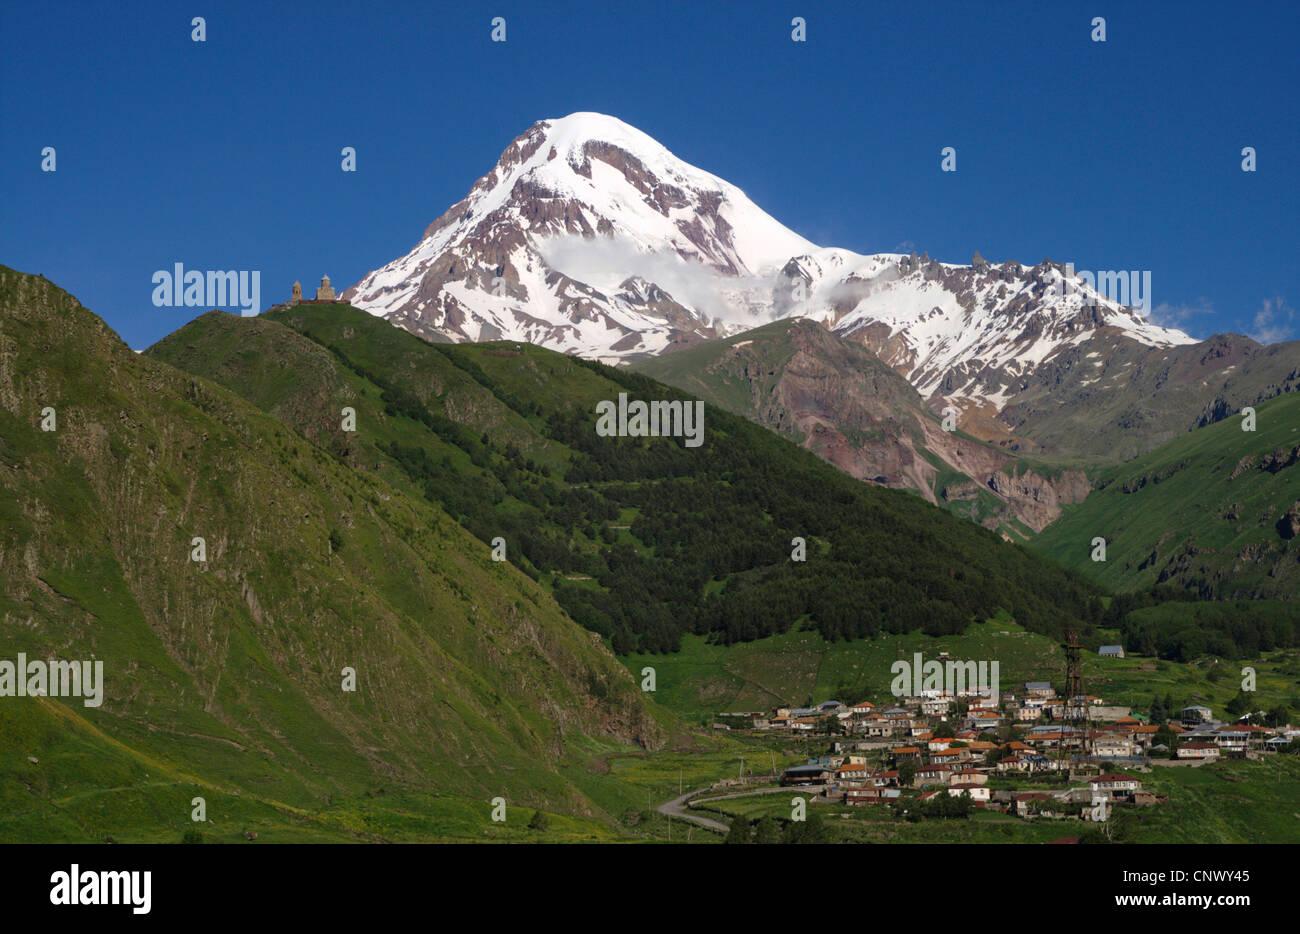 dormant stratovolcano Mount Kazbek (5.047 m), the domed Tsiminda Sameba church on the mountain range in the foreground, - Stock Image